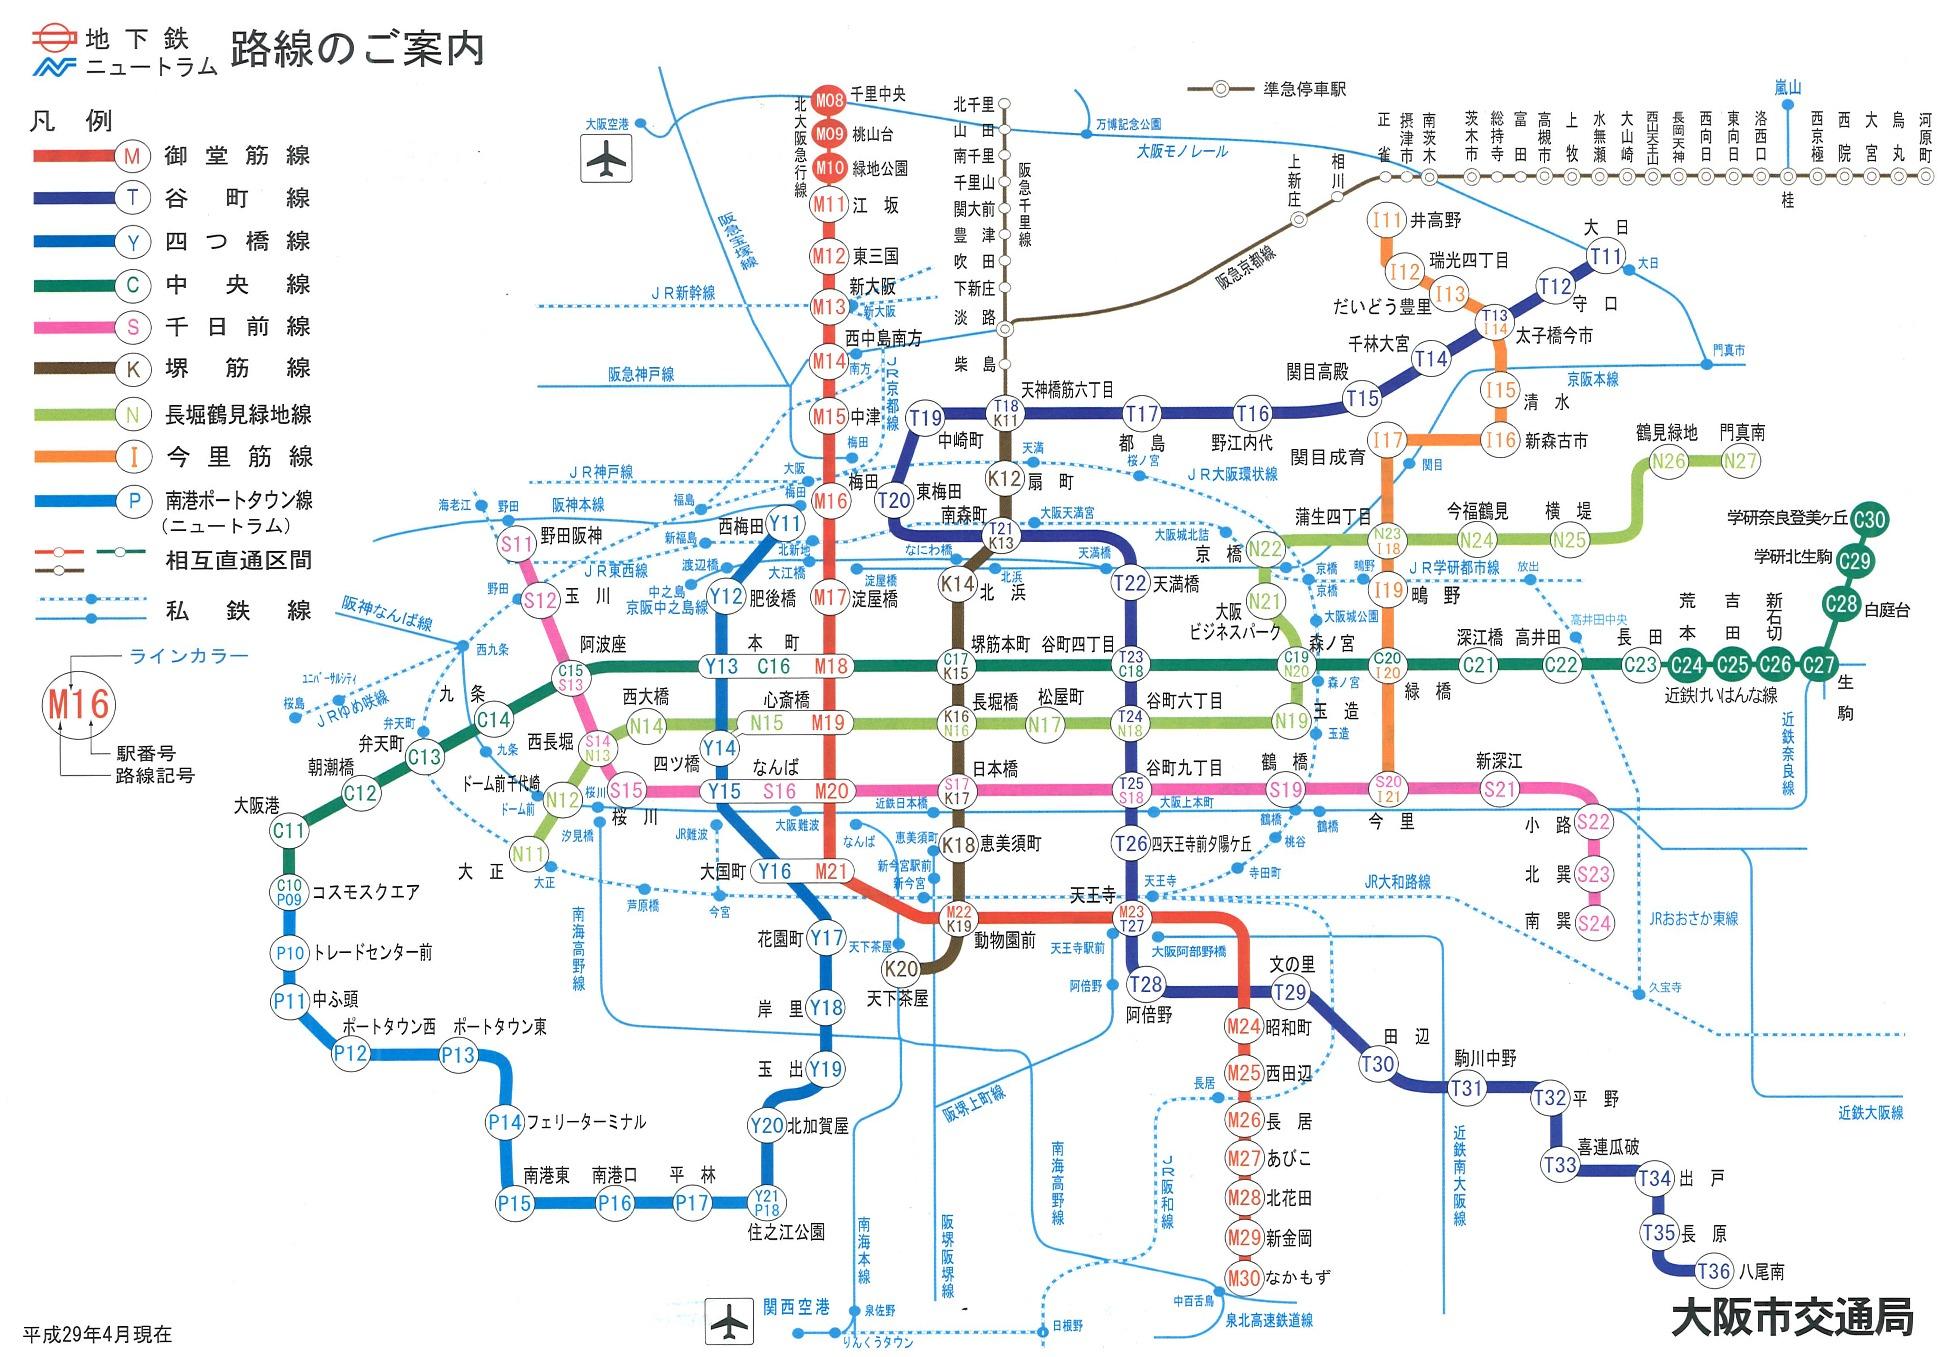 大阪地下鉄路線図 他沿線マップ